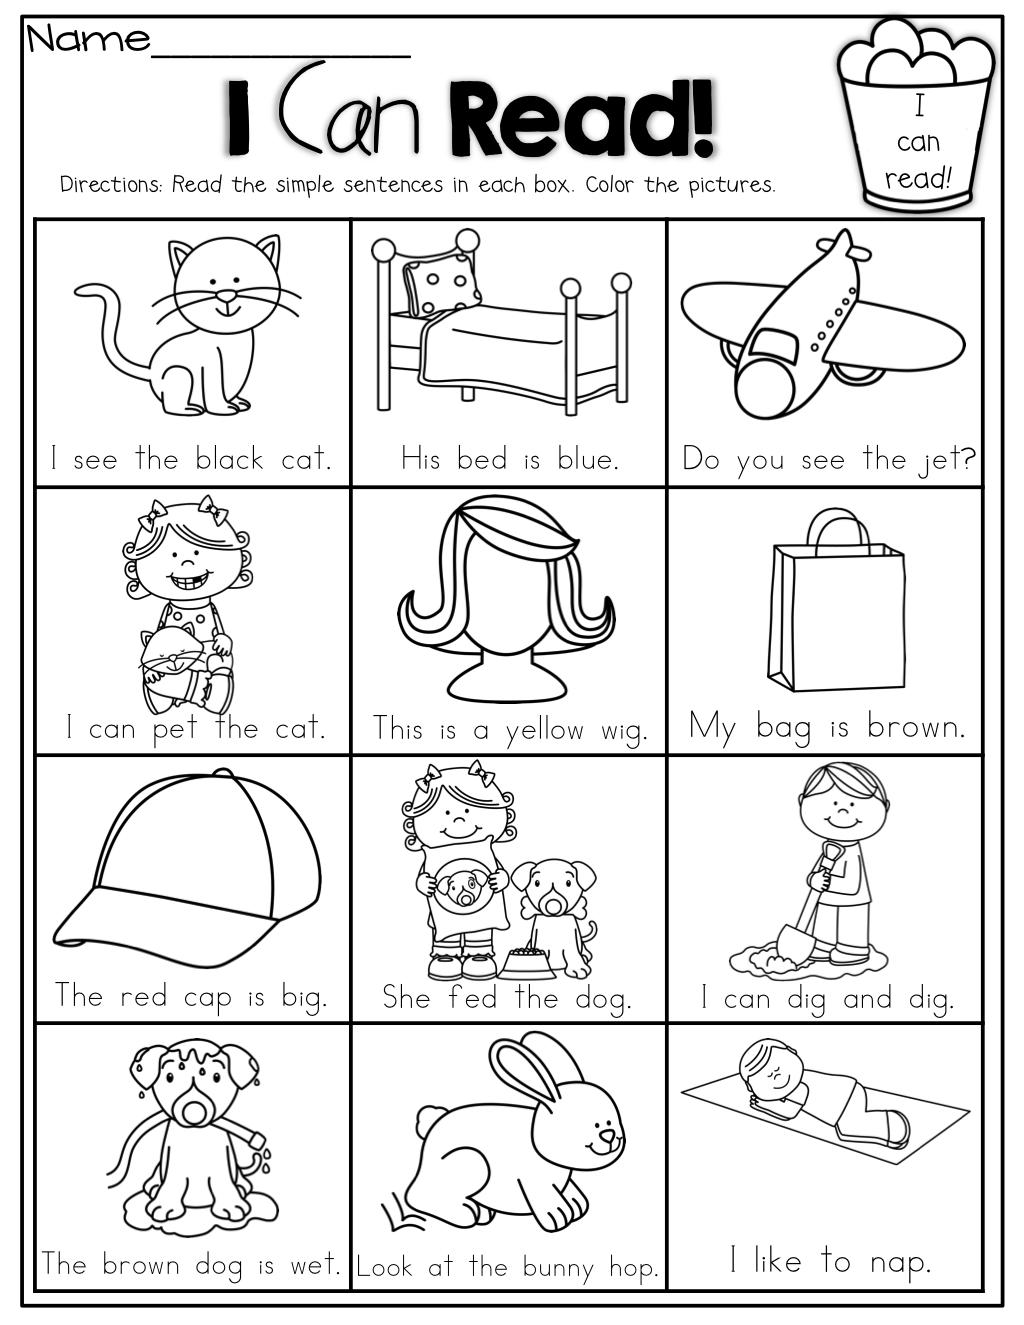 Free Reading Comprehension Is Suitable For Kindergarten Students Or B Reading Comprehension Worksheets Reading Comprehension Reading Comprehension Kindergarten [ 3300 x 2550 Pixel ]